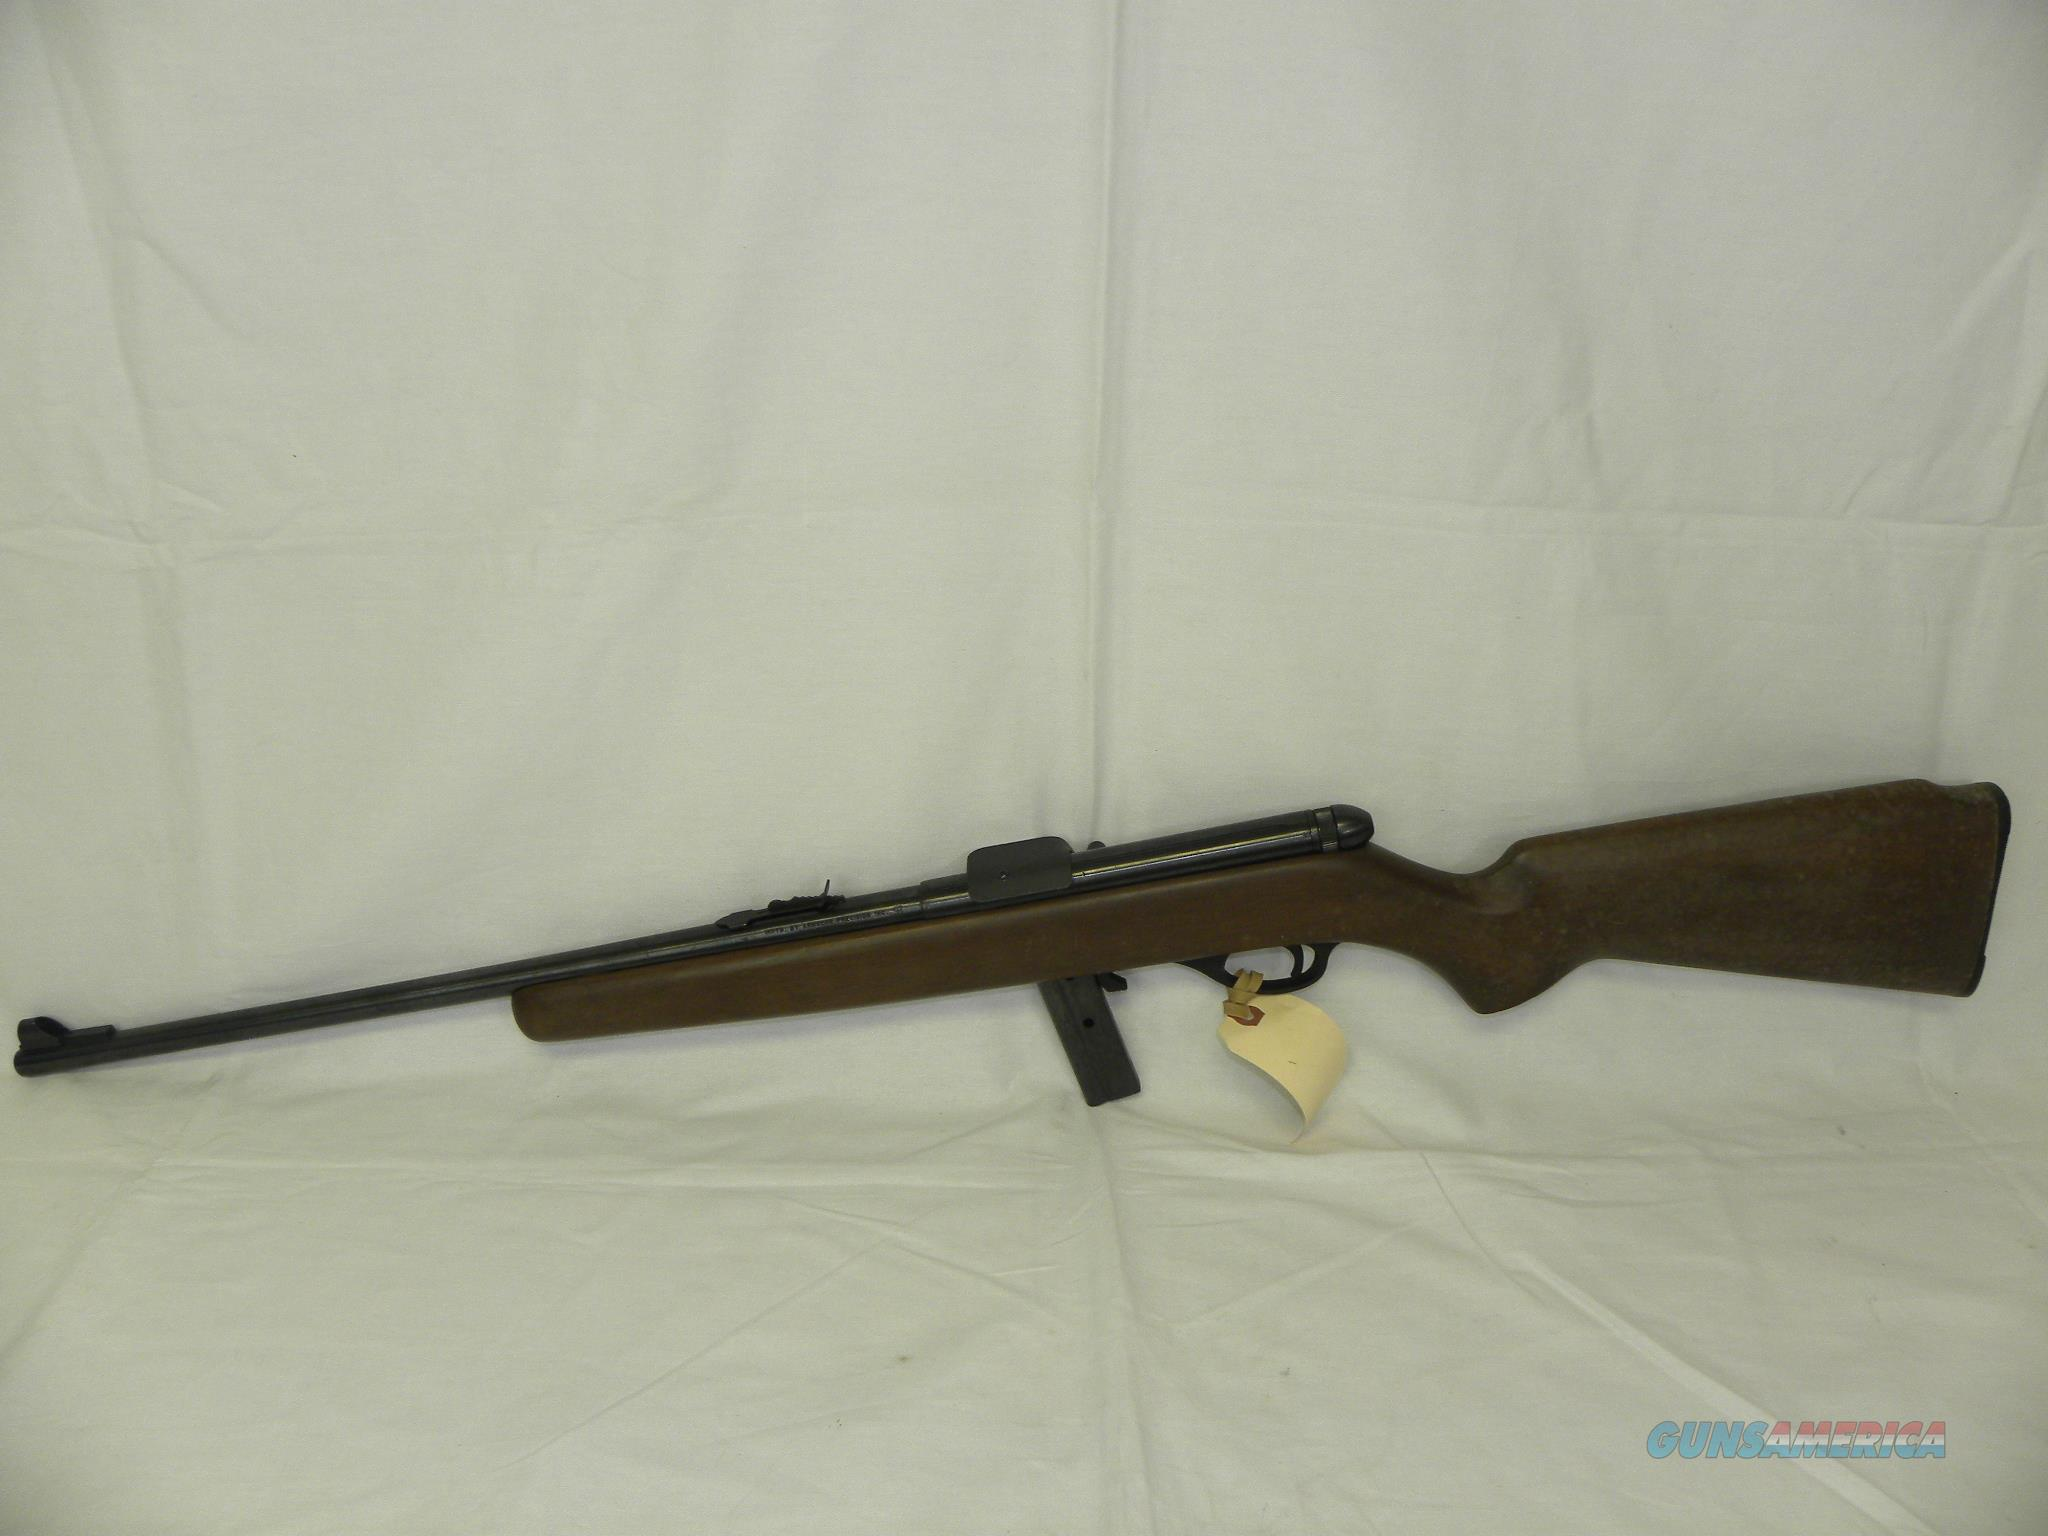 Armscor 20P Semi-Auto  Guns > Rifles > Armscor Rifles > .22 Cal versions